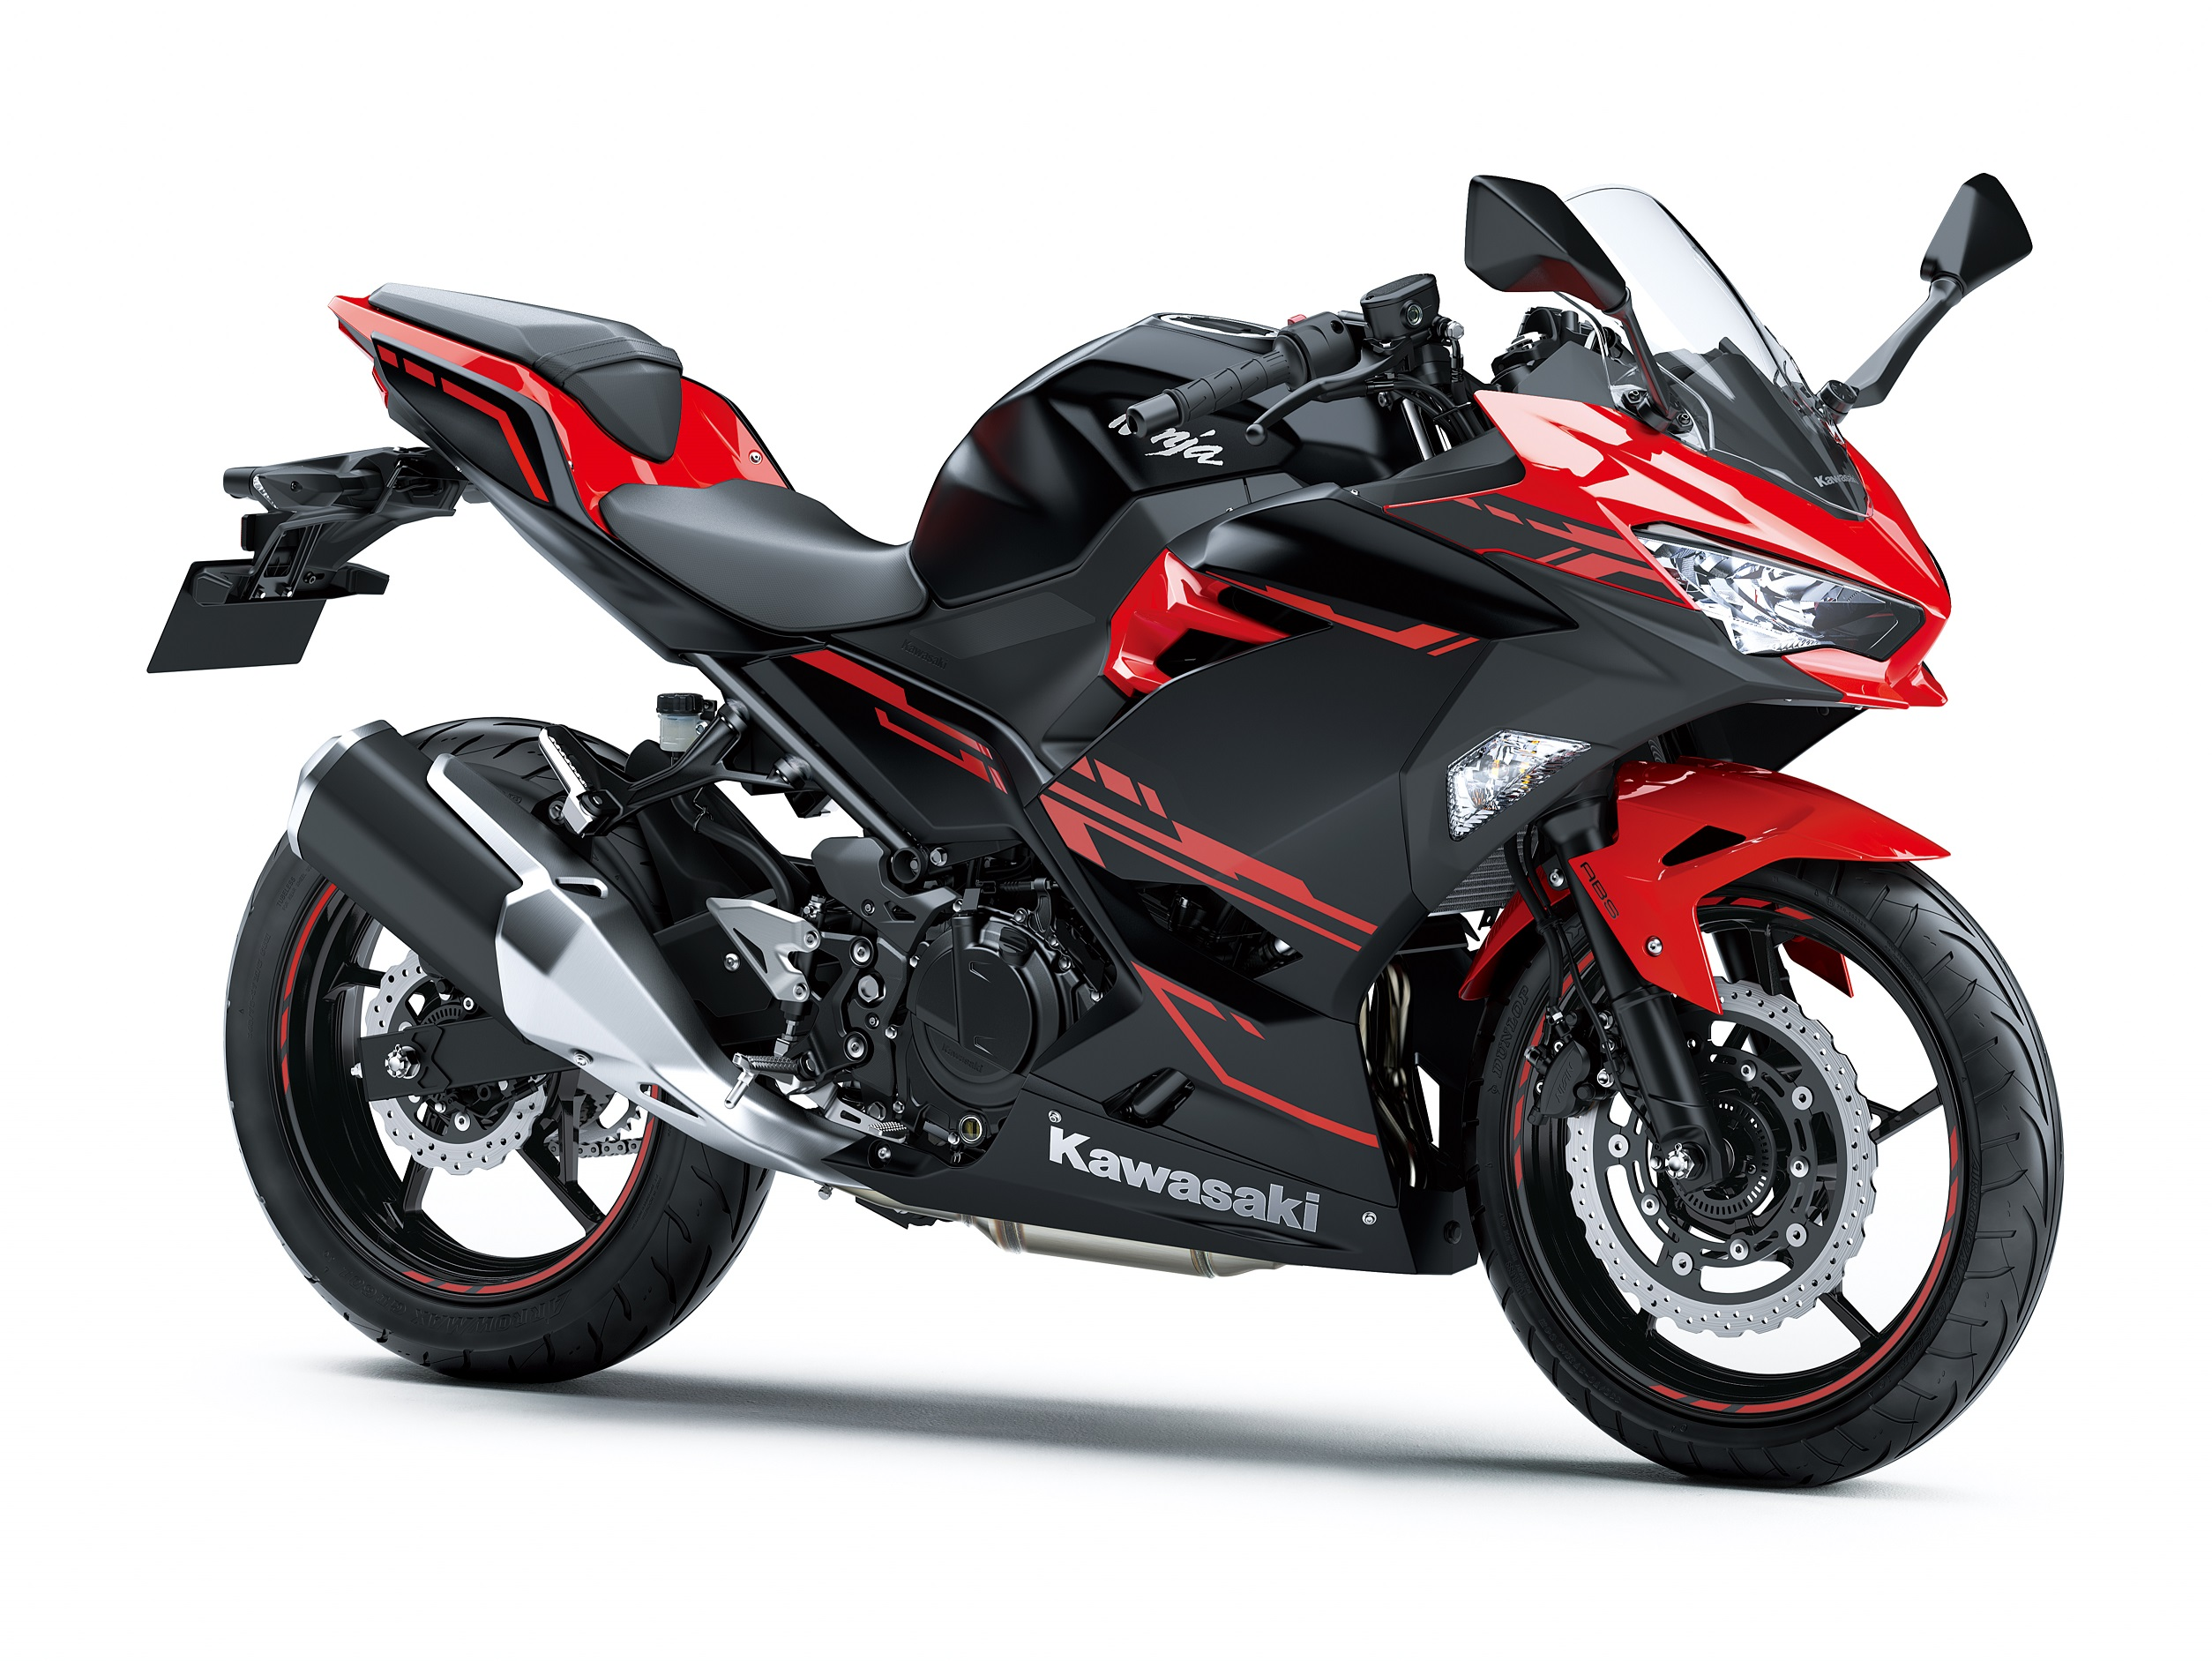 Bikes Kawasaki Motors Malaysia Unleashes New Ninja 250 Priced At Rm23 071 Video News And Reviews On Malaysian Cars Motorcycles And Automotive Lifestyle